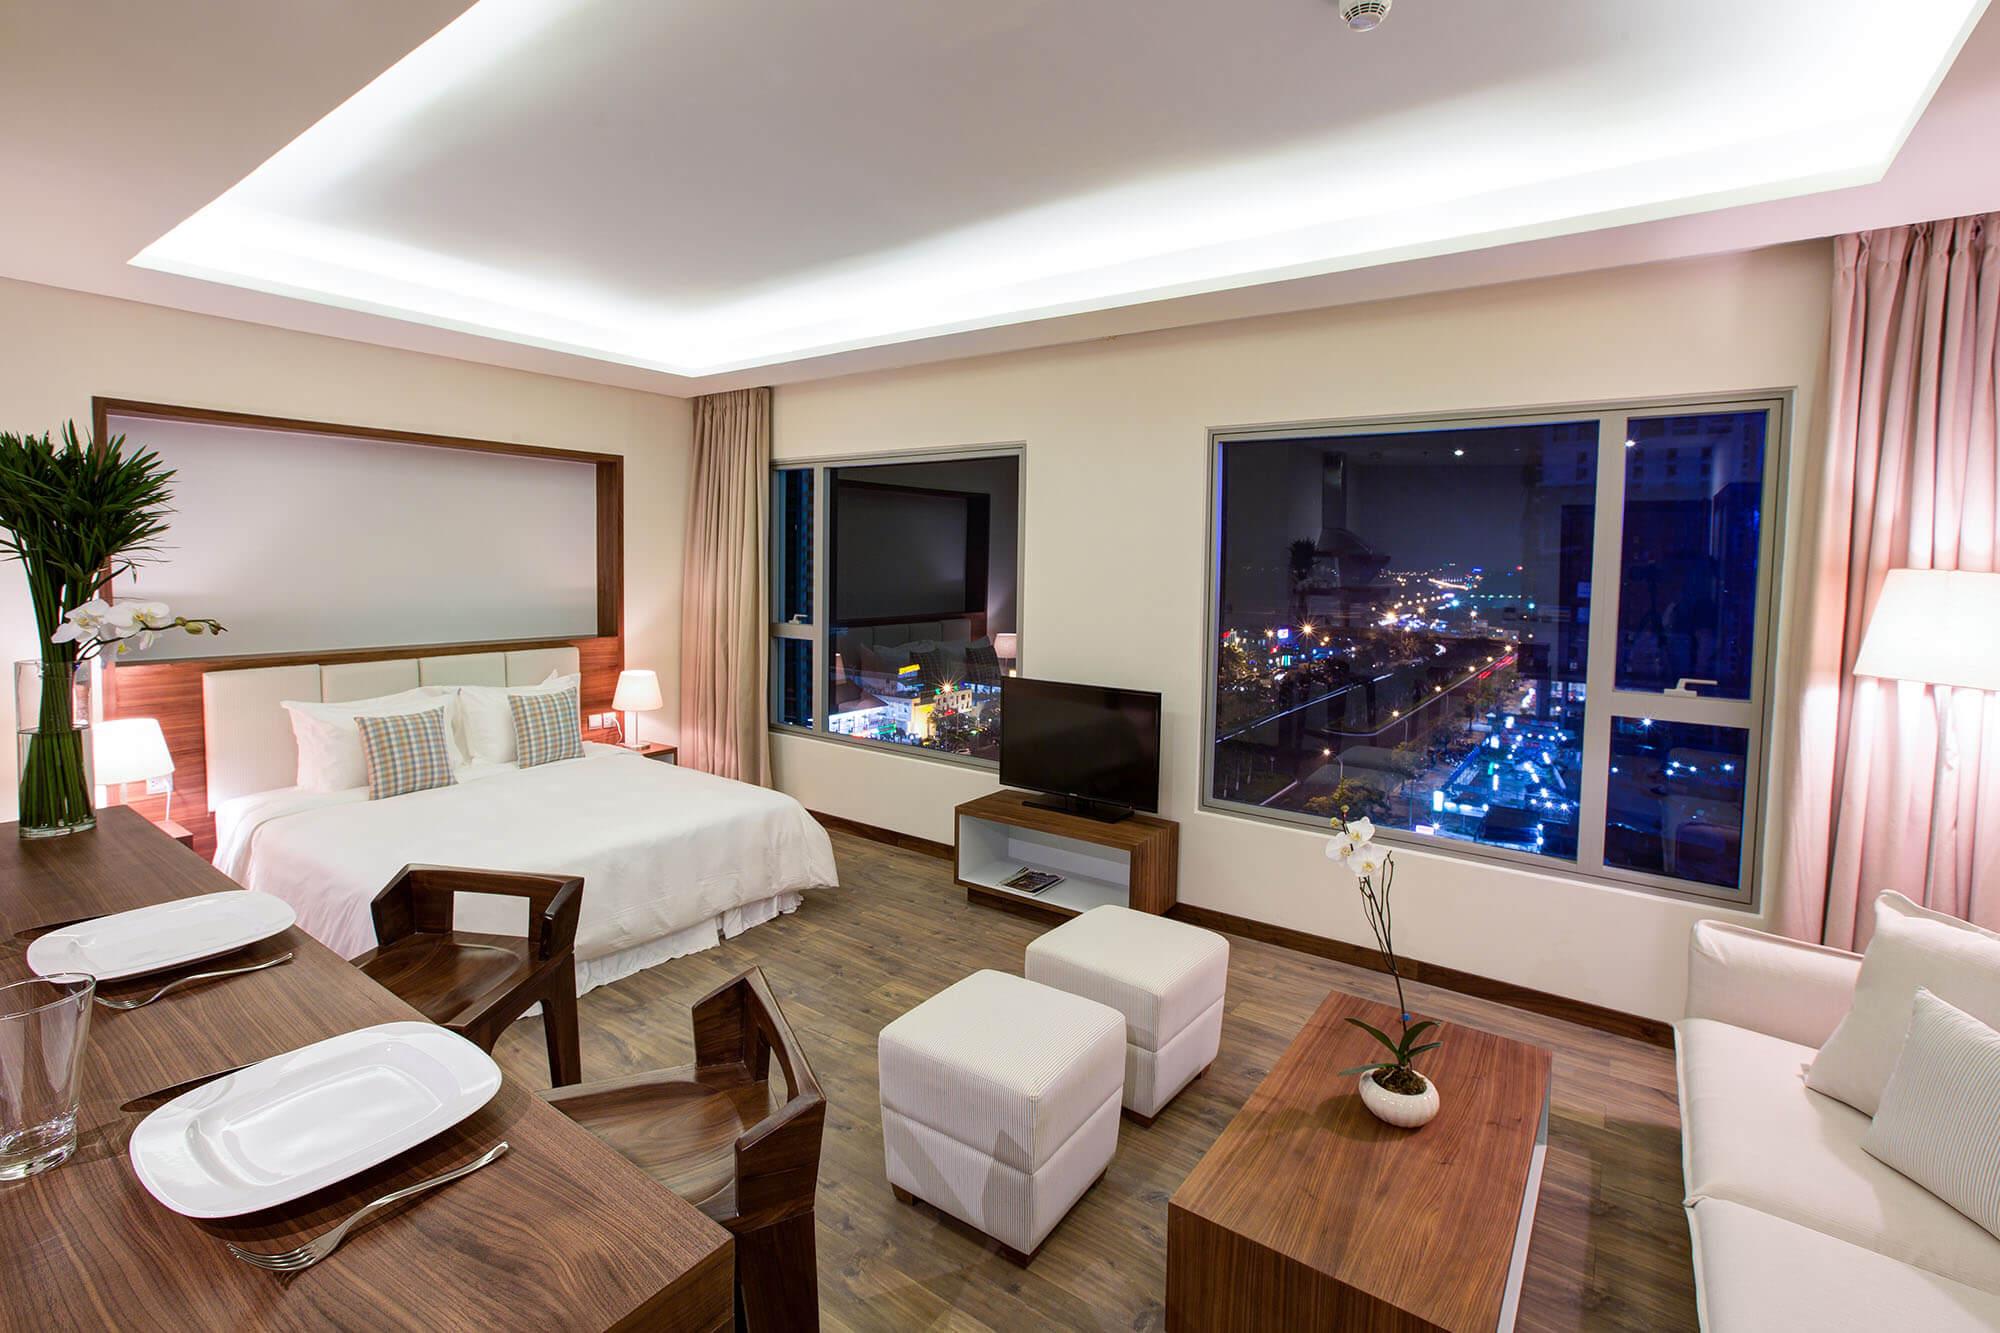 Light Studio A La Carte Danang Beach Hotel 200 Vo Nguyen Giap Danang Fantasticity Com